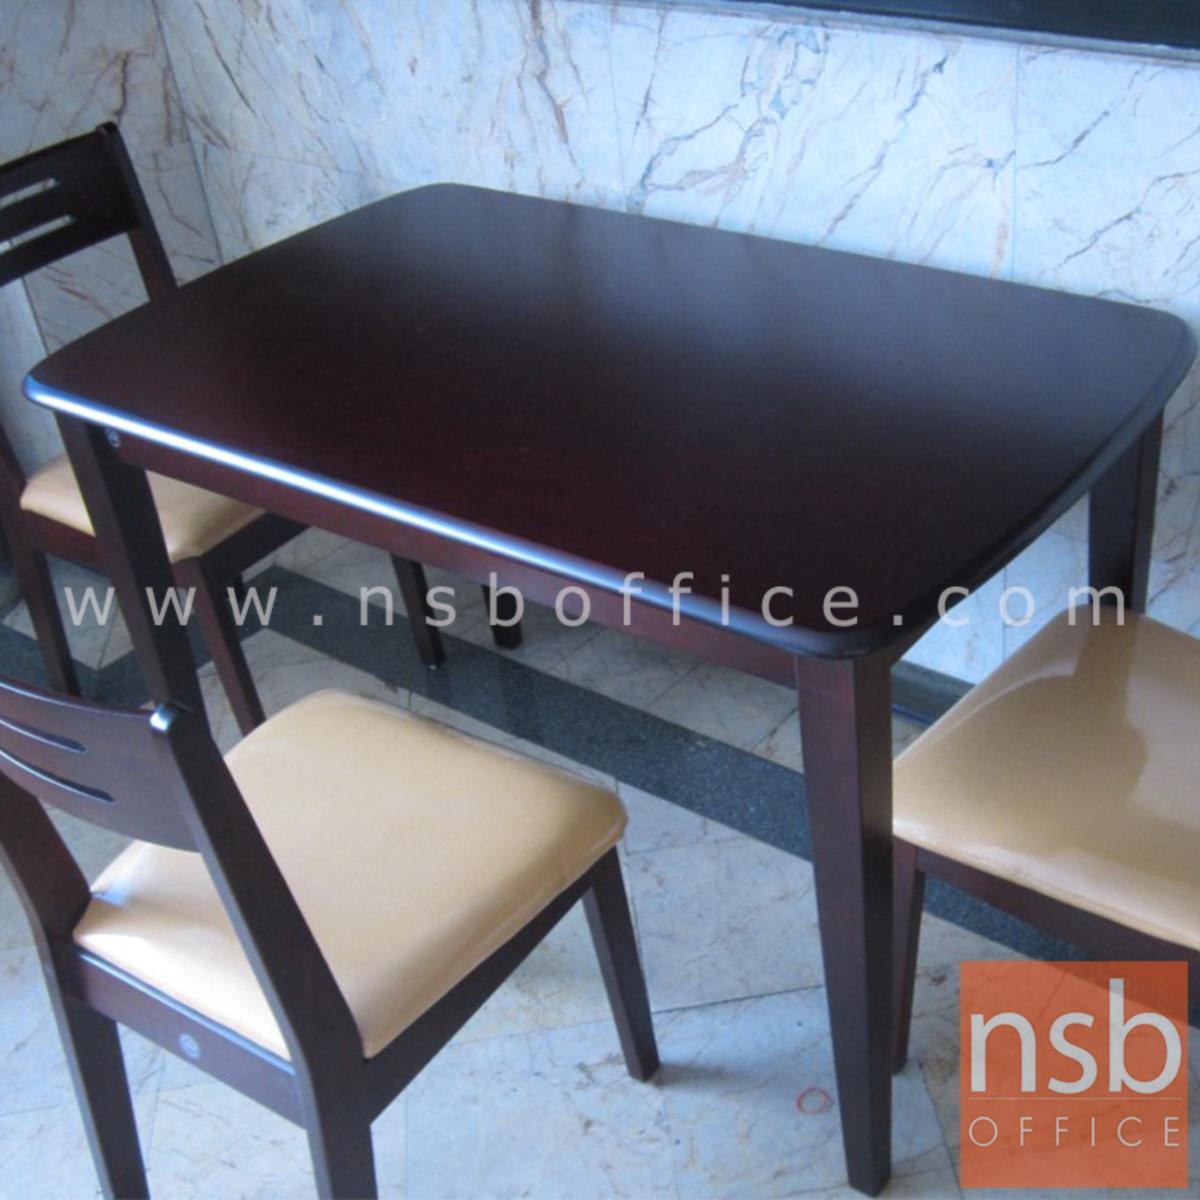 G14A184:โต๊ะรับประทานอาหาร รุ่น Swift (สวิฟ) ขนาด 120W , 150W cm ไม้ยางพารา